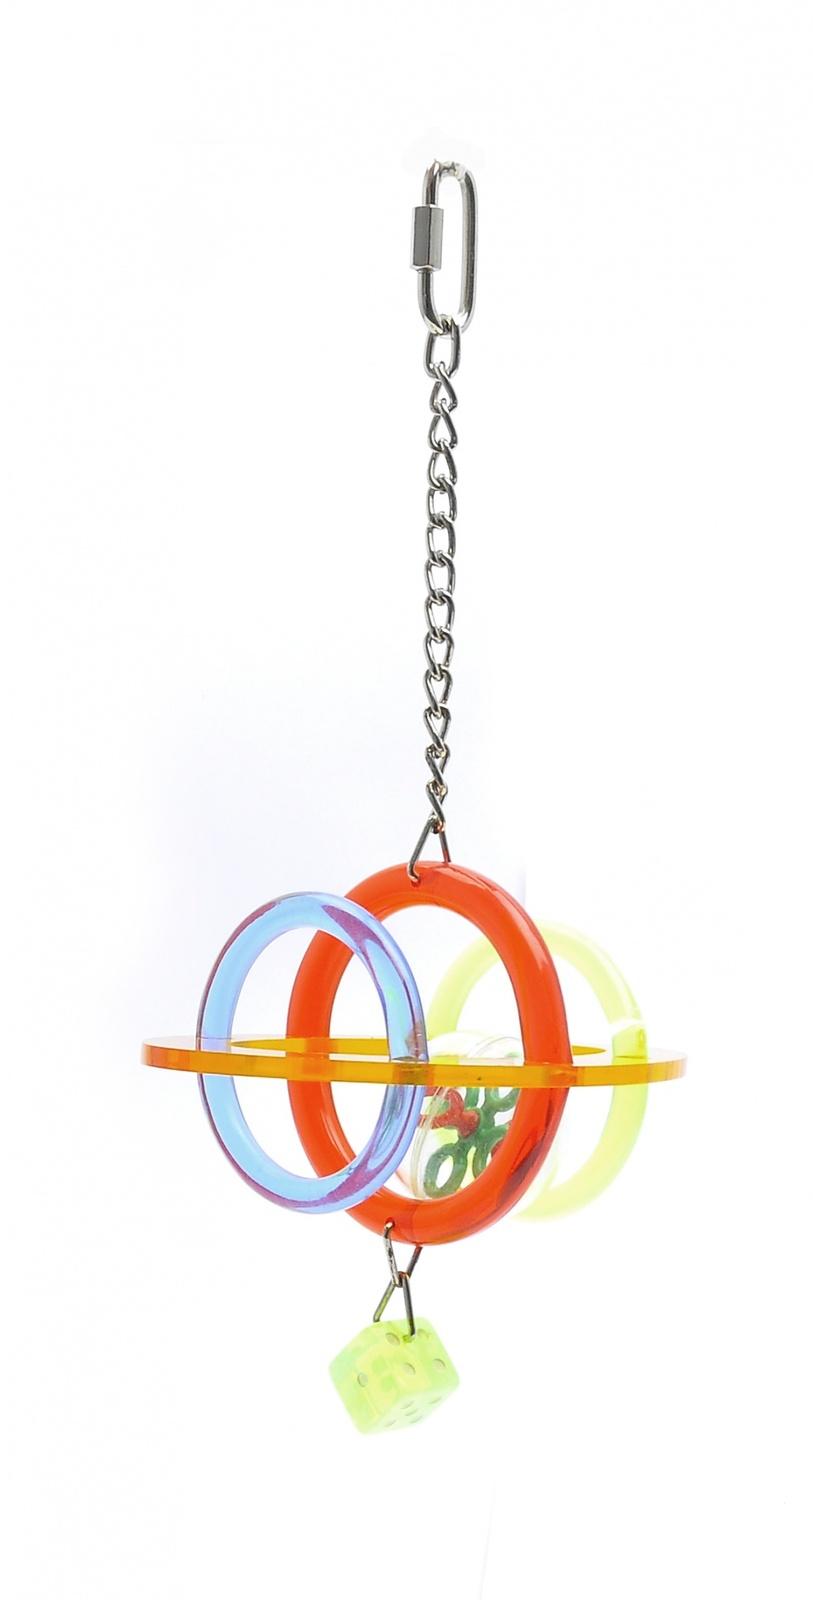 "Benelux Игрушка для попугаев ""Гоша"", 17*10*10 см (Coco toys for parrots and parrakeet) 14417 от Ravta"